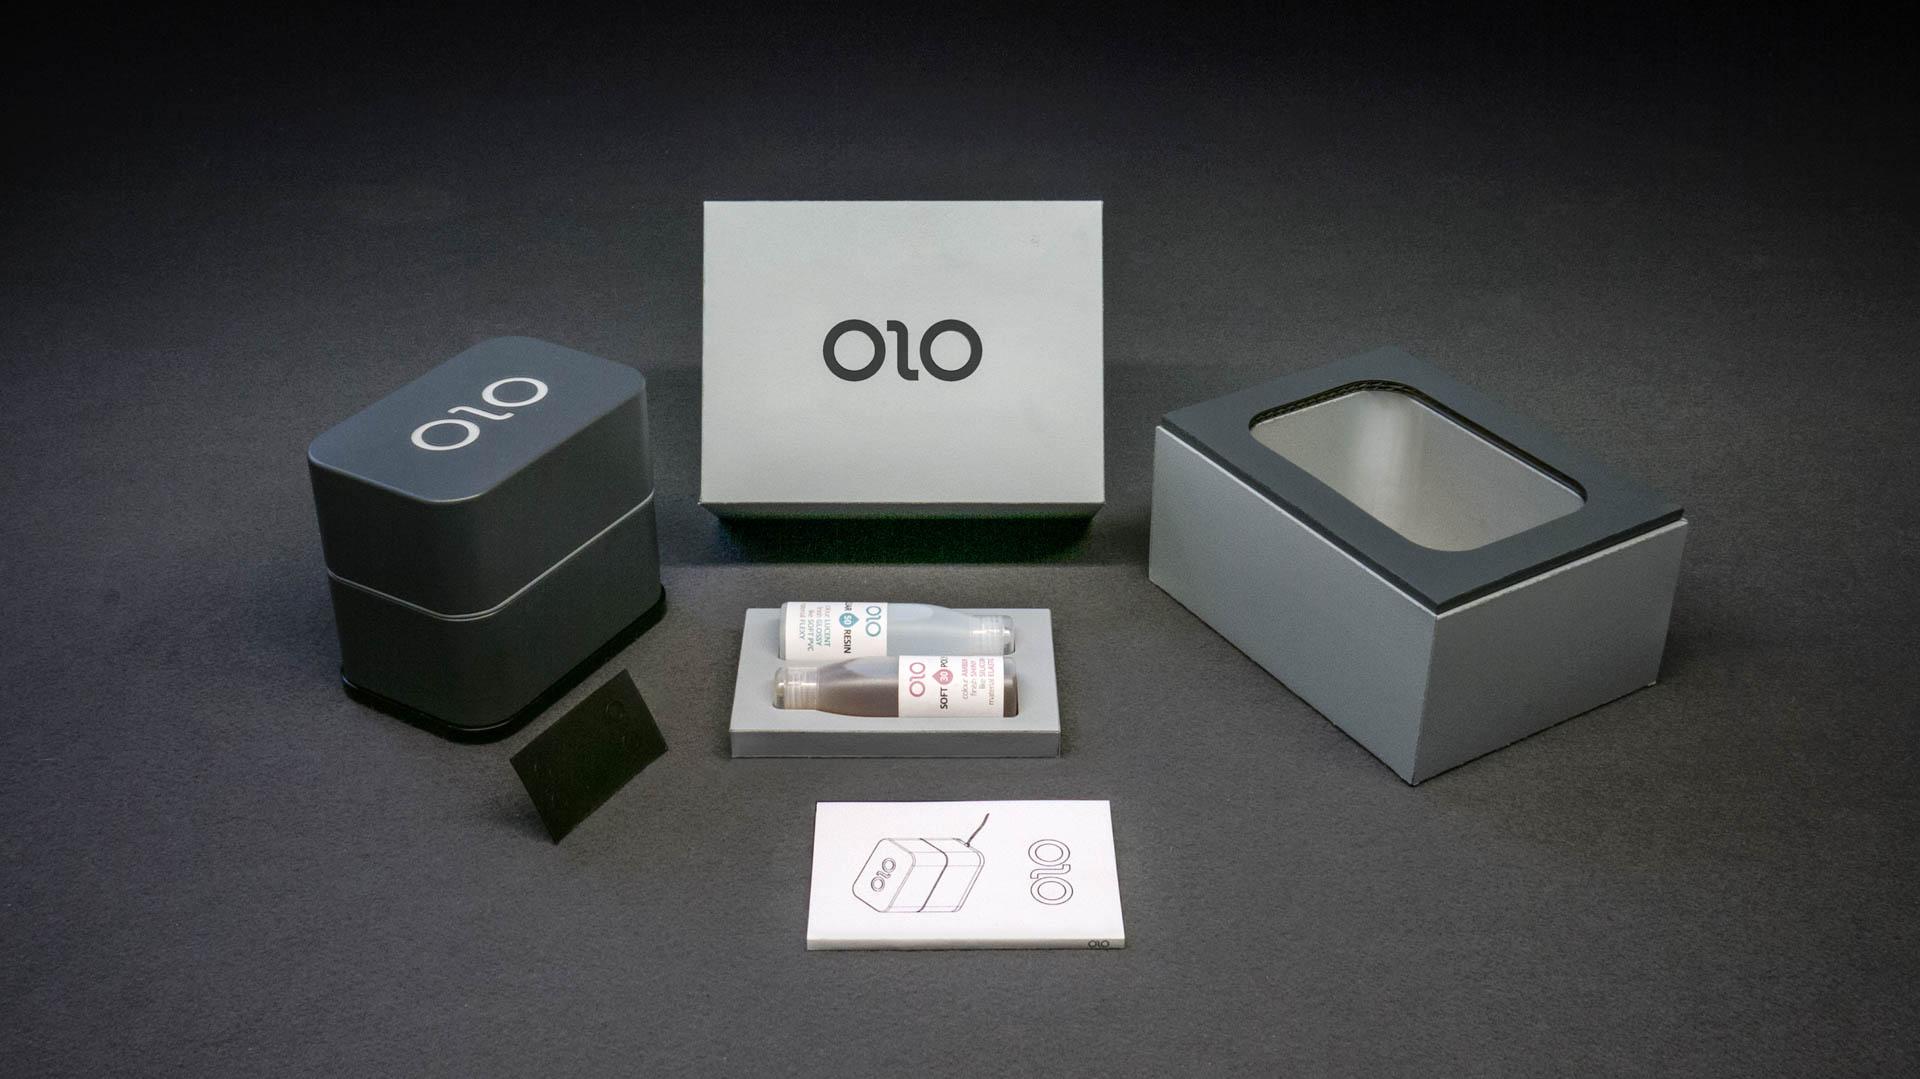 olo 3d smartphone printer kit